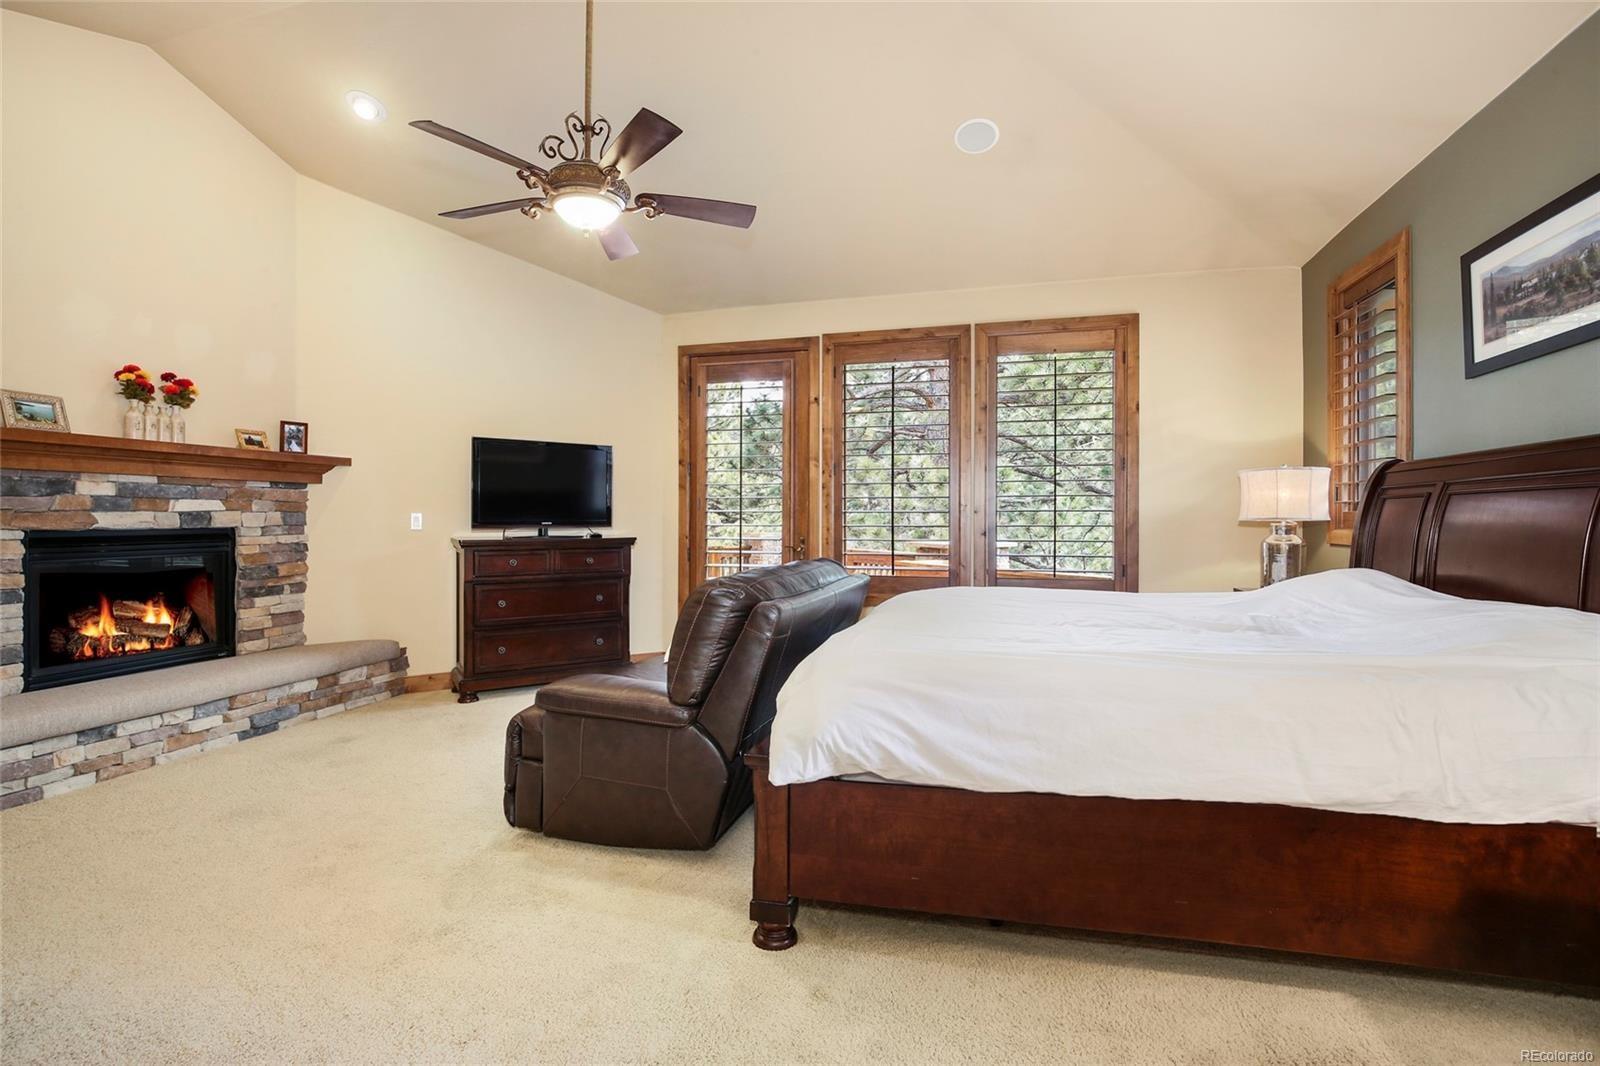 MLS# 4879945 - 18 - 2392 Saddleback Drive, Castle Rock, CO 80104